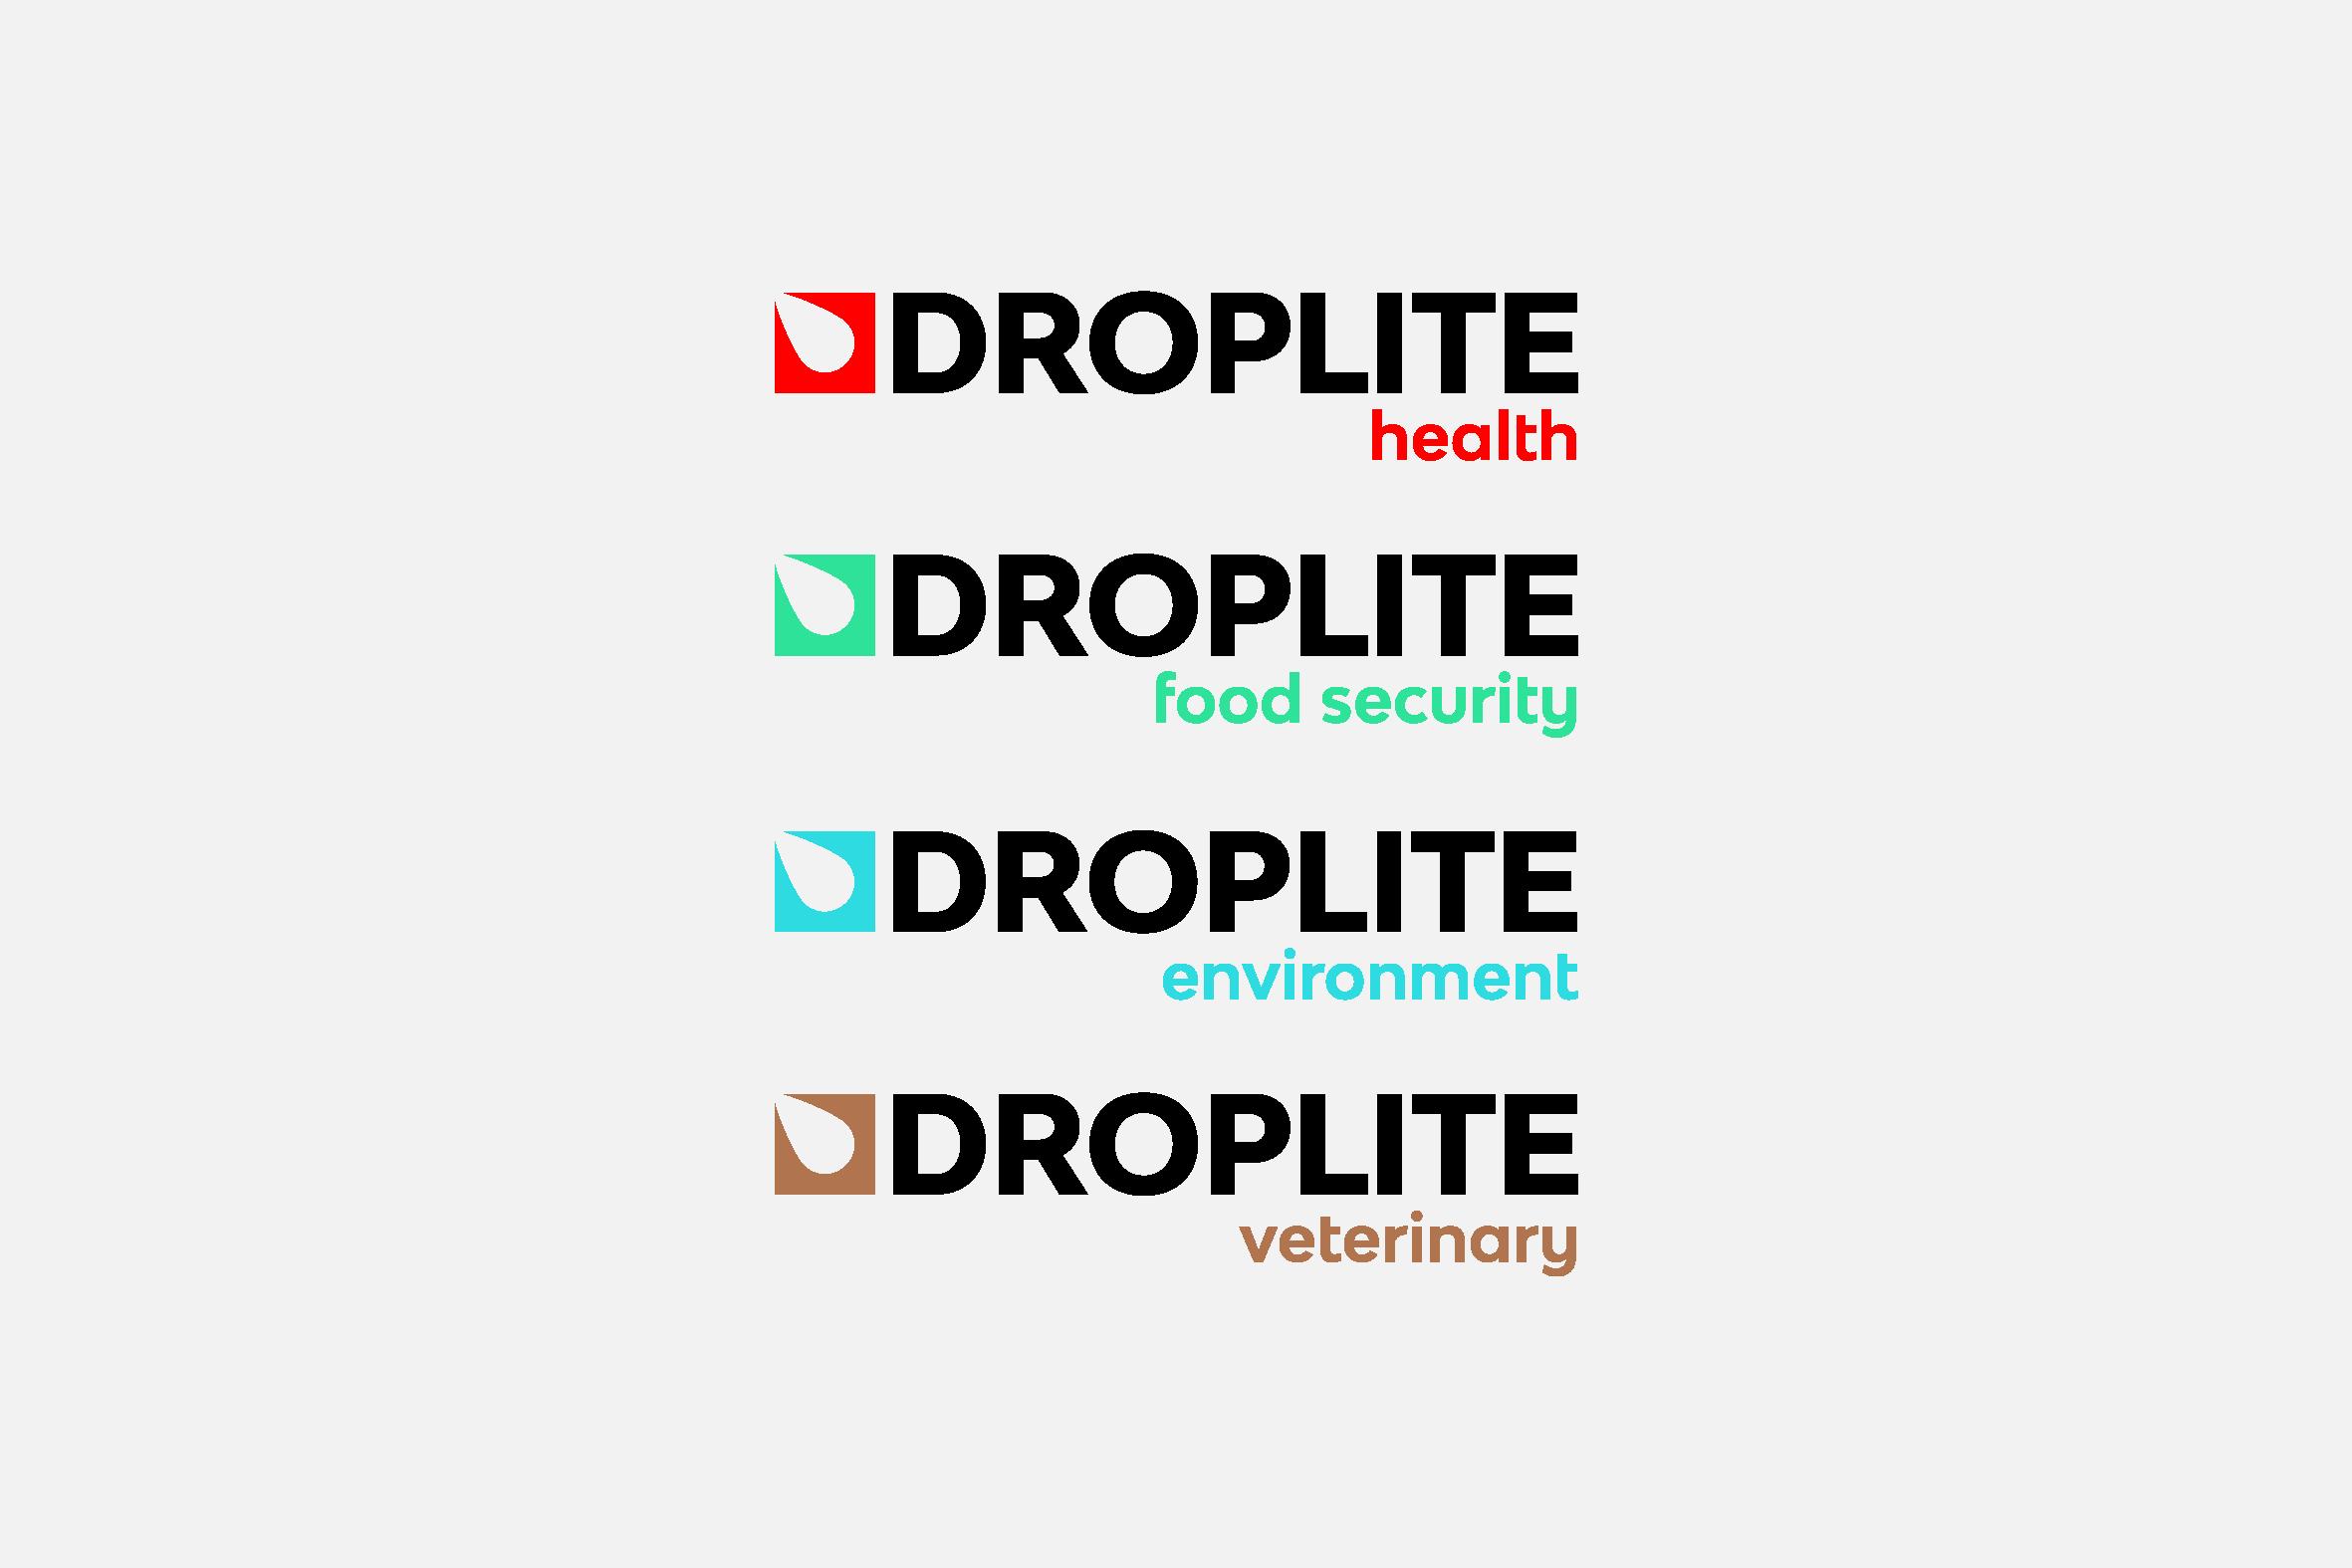 Bitflow-studio-droplite-logo-design-technology-startup-6